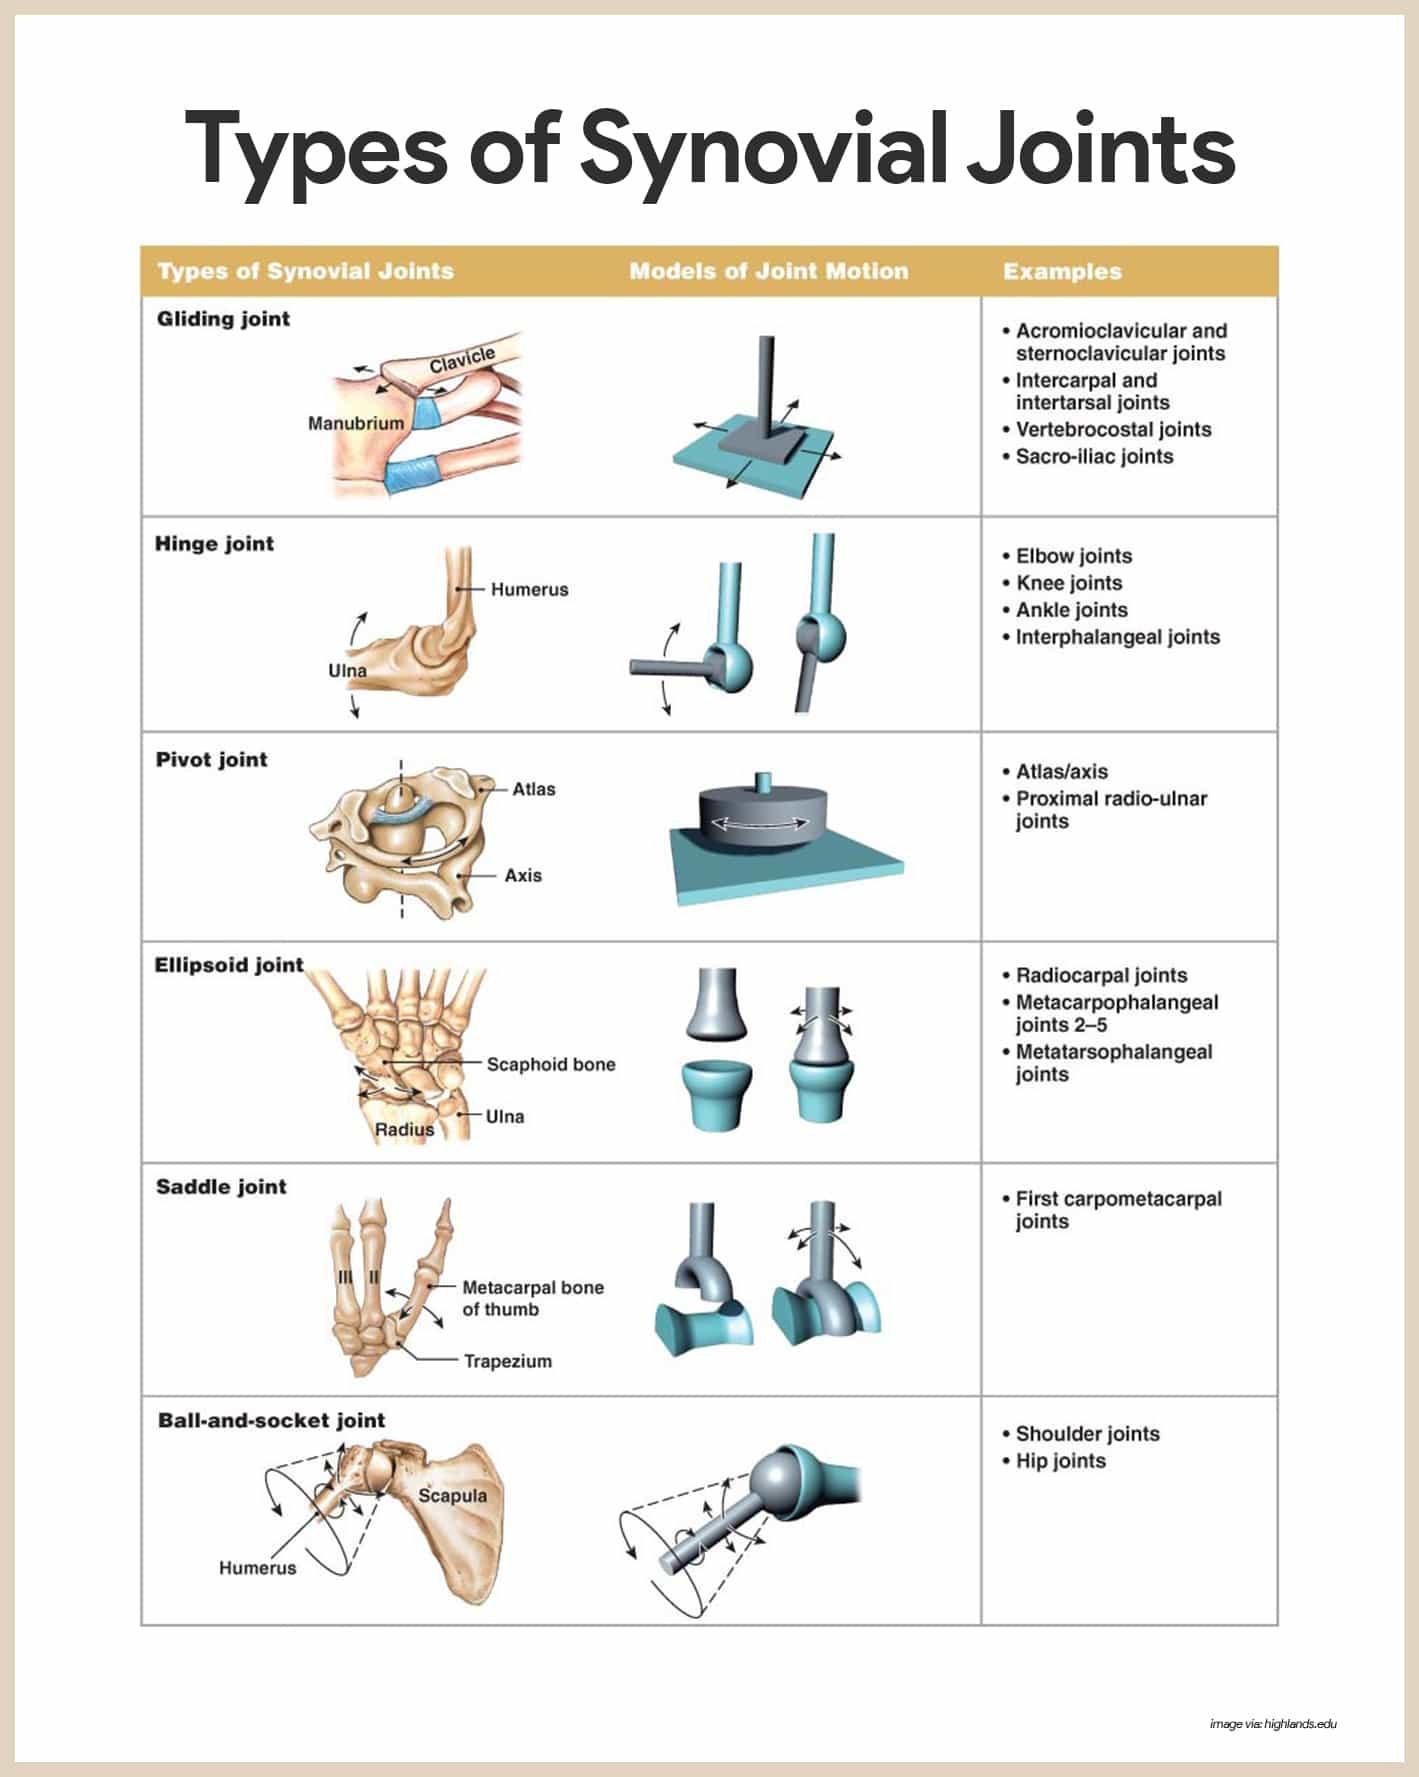 Appendicular Skeleton Worksheet Answers Skeletal System Anatomy and Physiology Nurseslabs